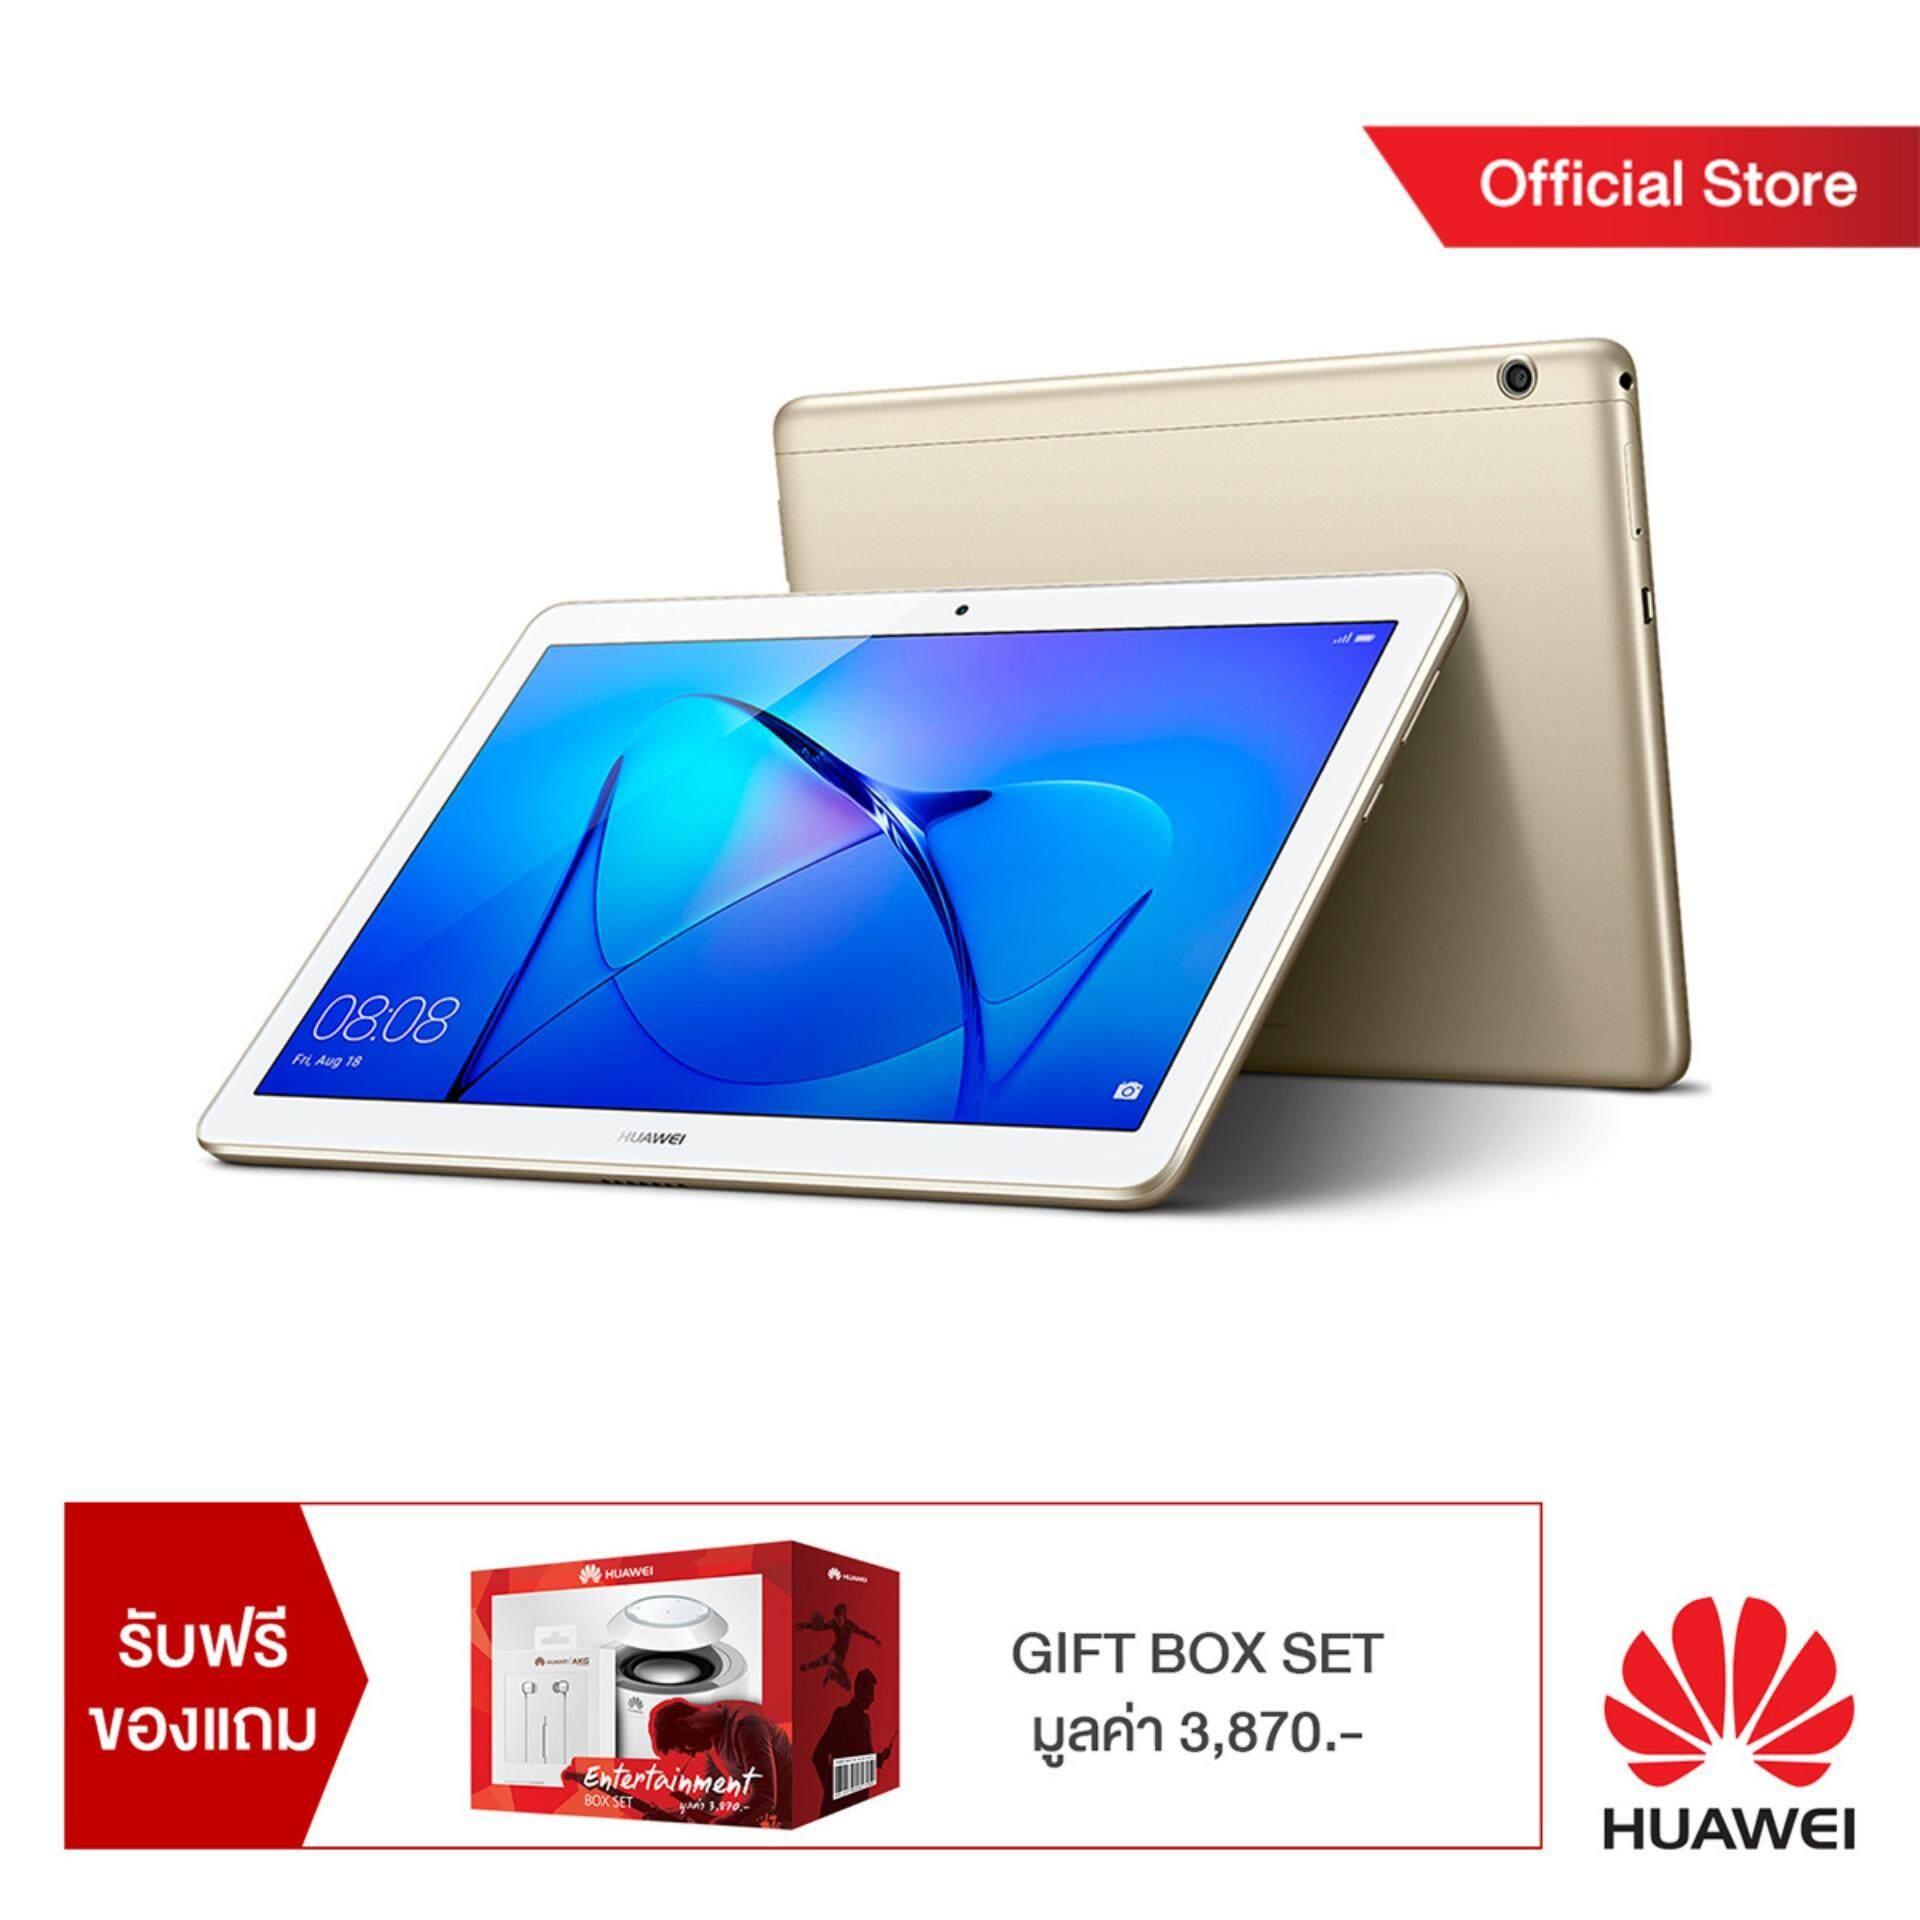 Huawei Mediapad T3 10 4G 16Gb Luxurious Gold พิเศษ รับฟรี Box Set มูลค่า 3 870 บาท ใน กรุงเทพมหานคร